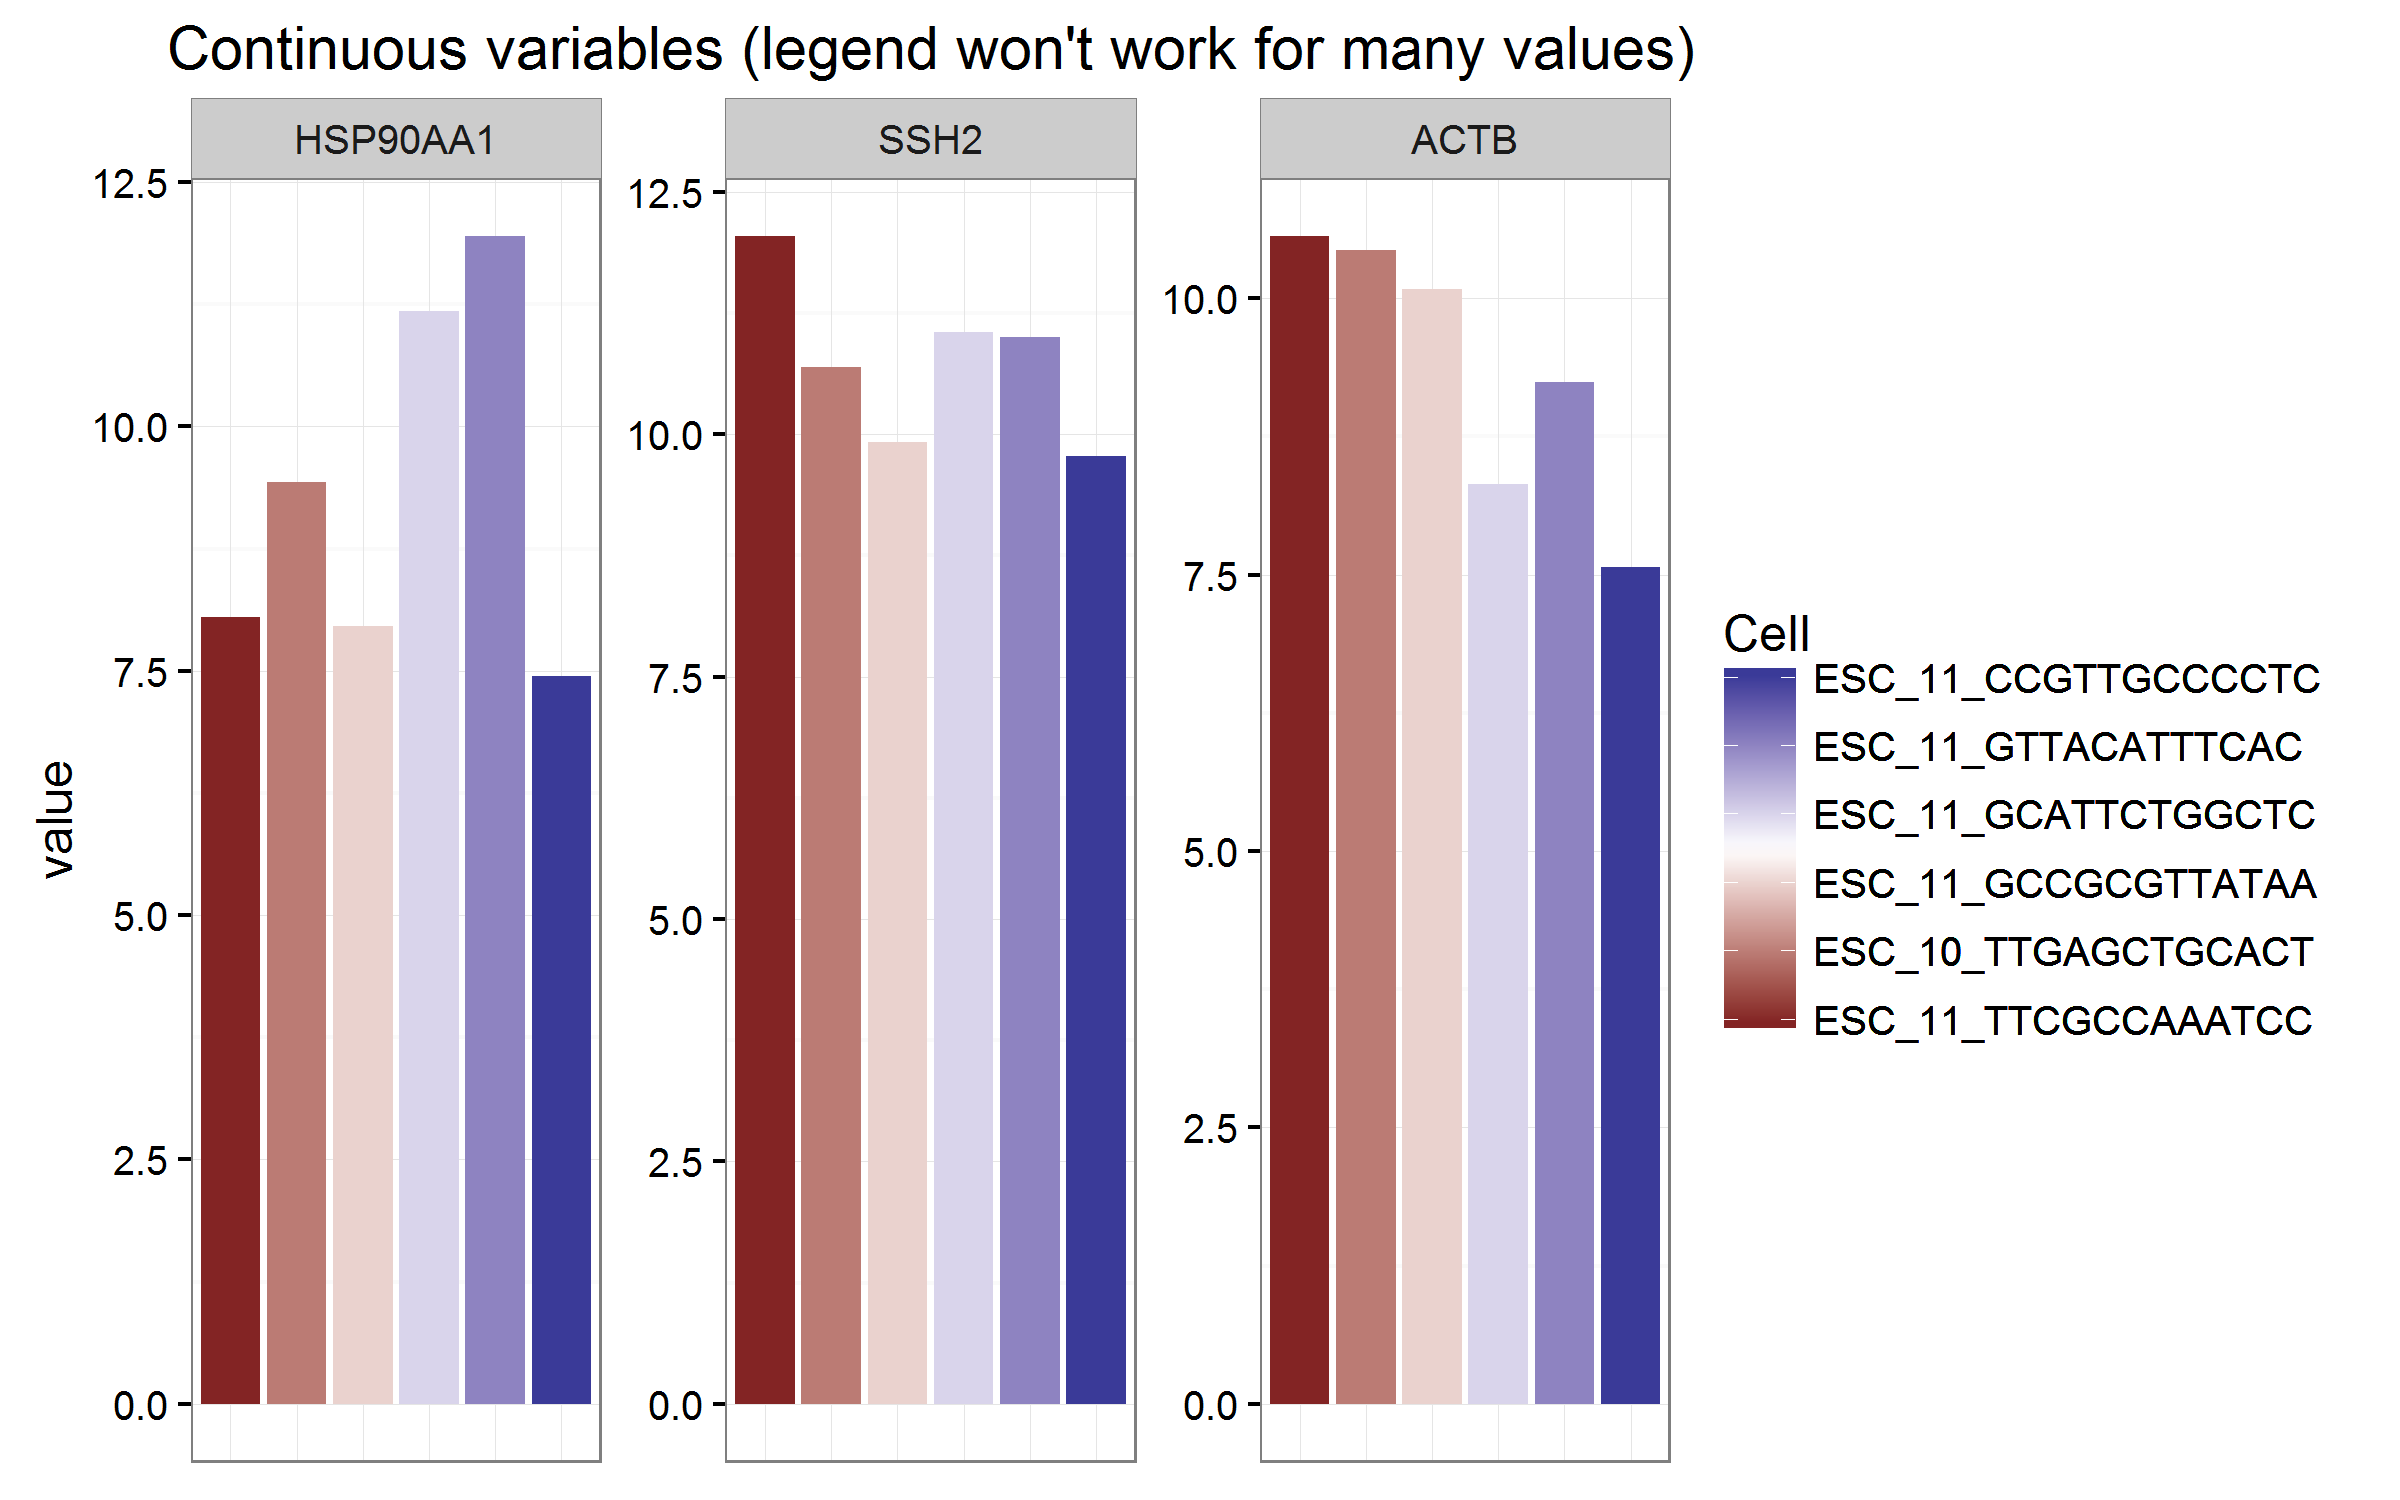 x value manual ggplot2 breaks